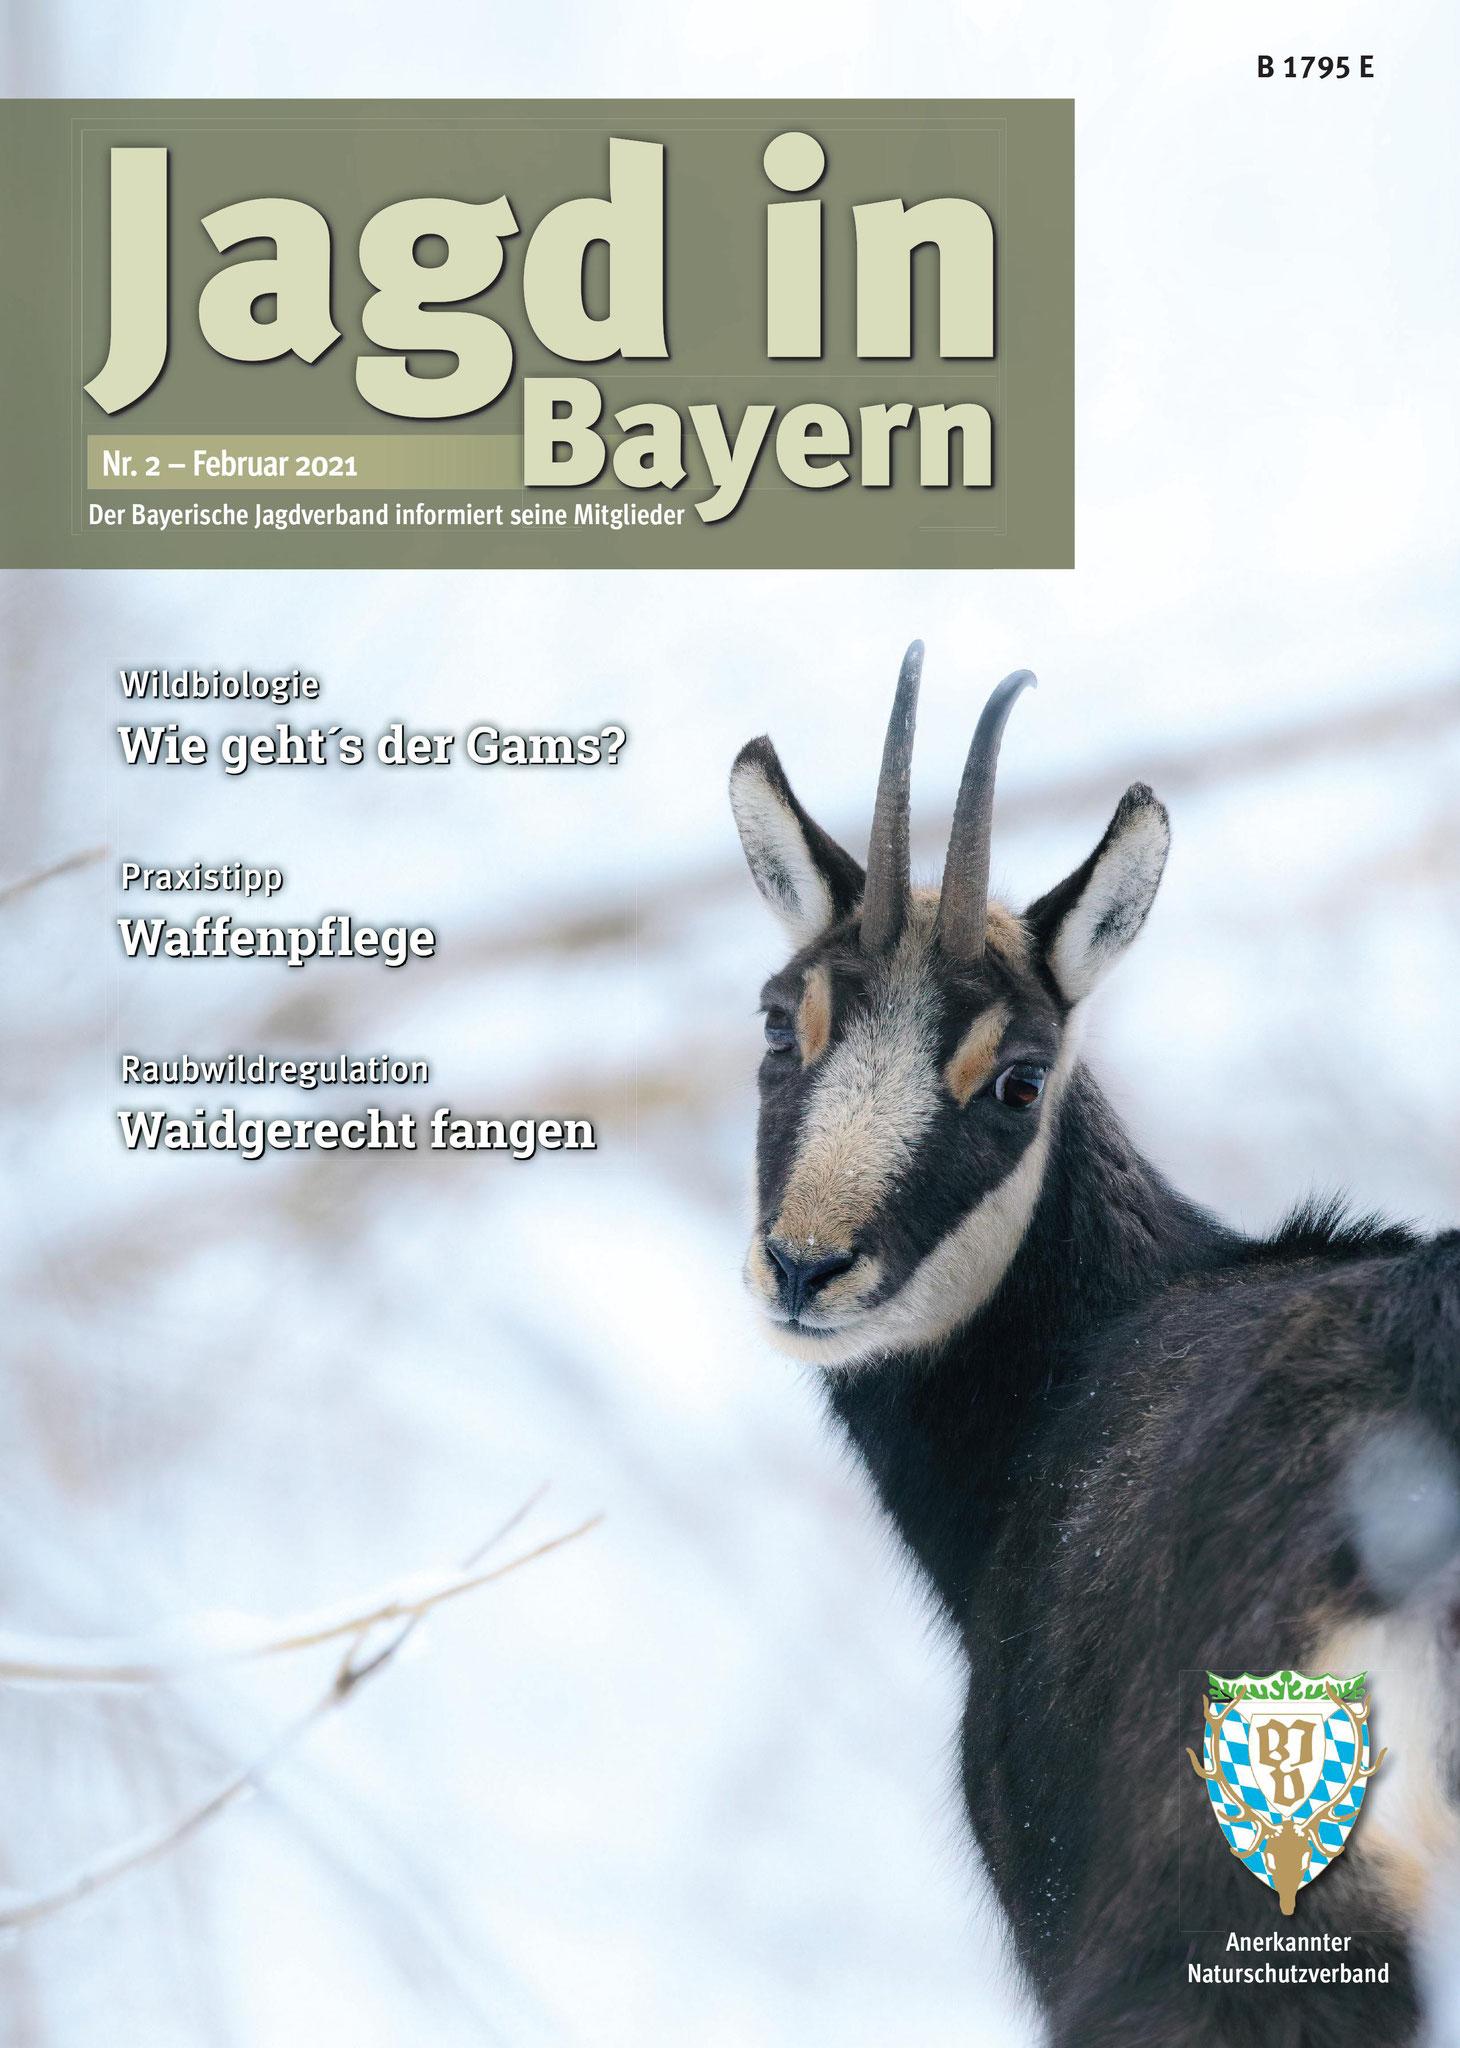 Titelseite der Jagd in Bayern Nr. 2 - Februar 2021